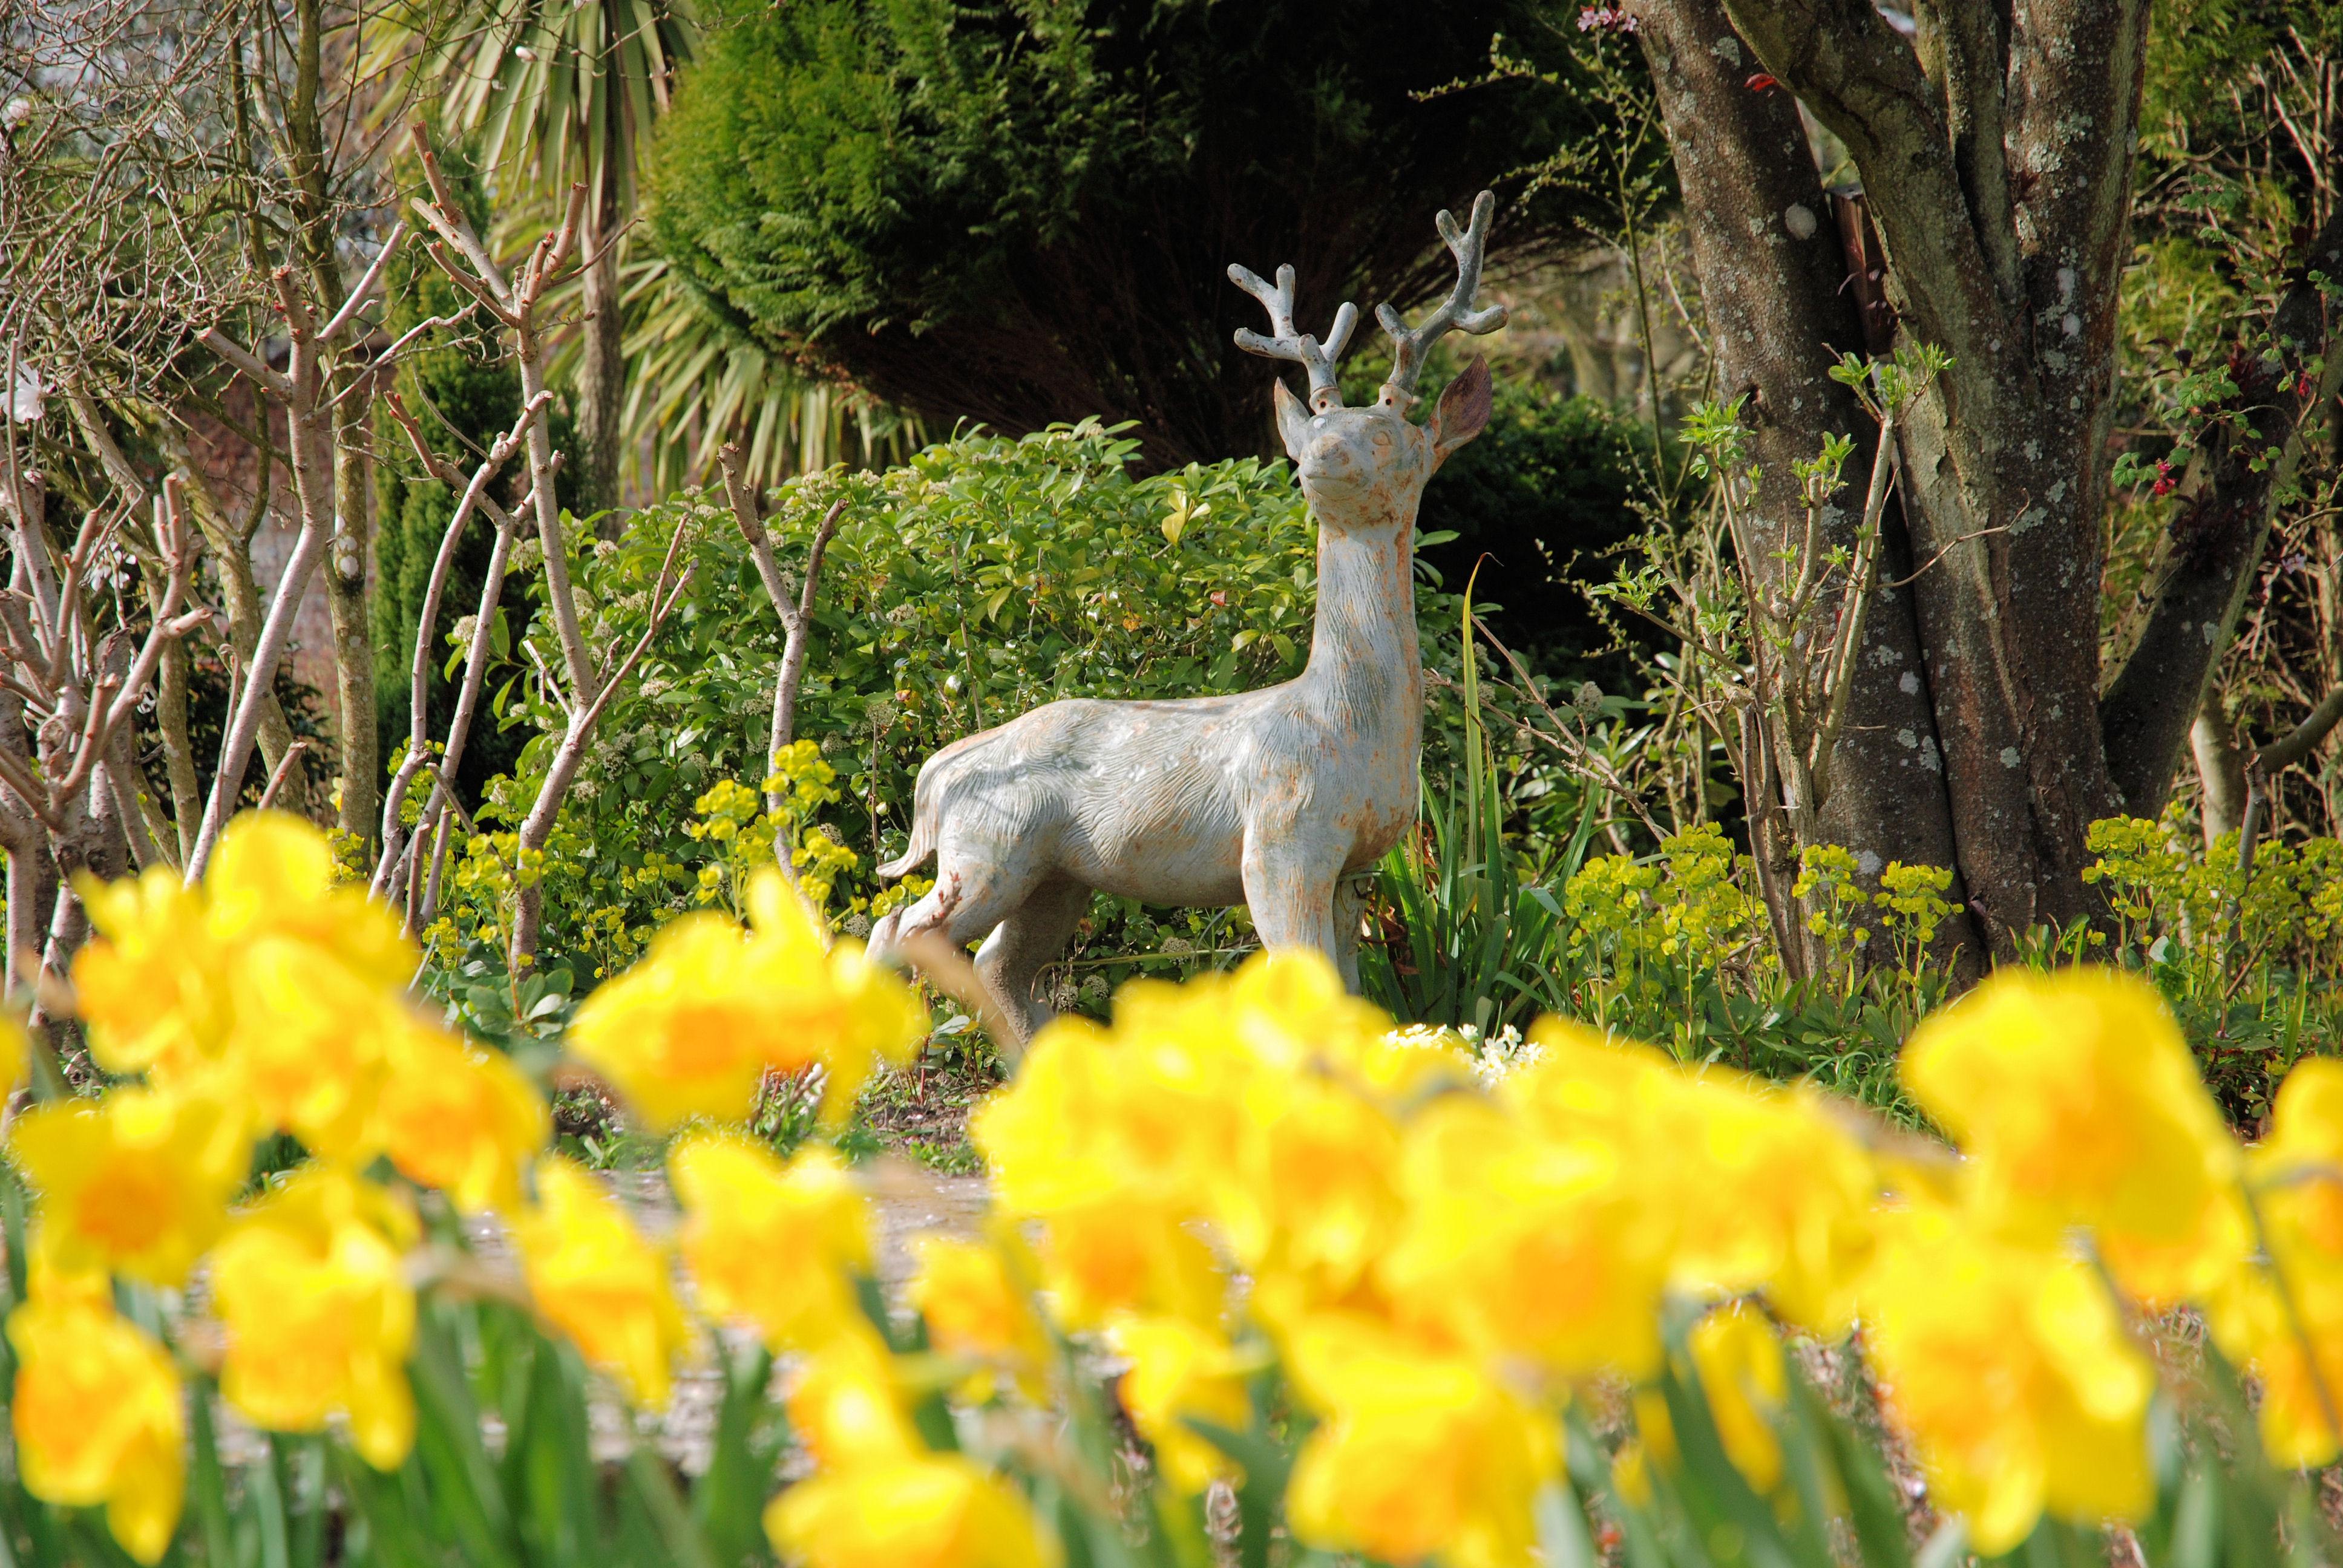 Daffodils garden statue